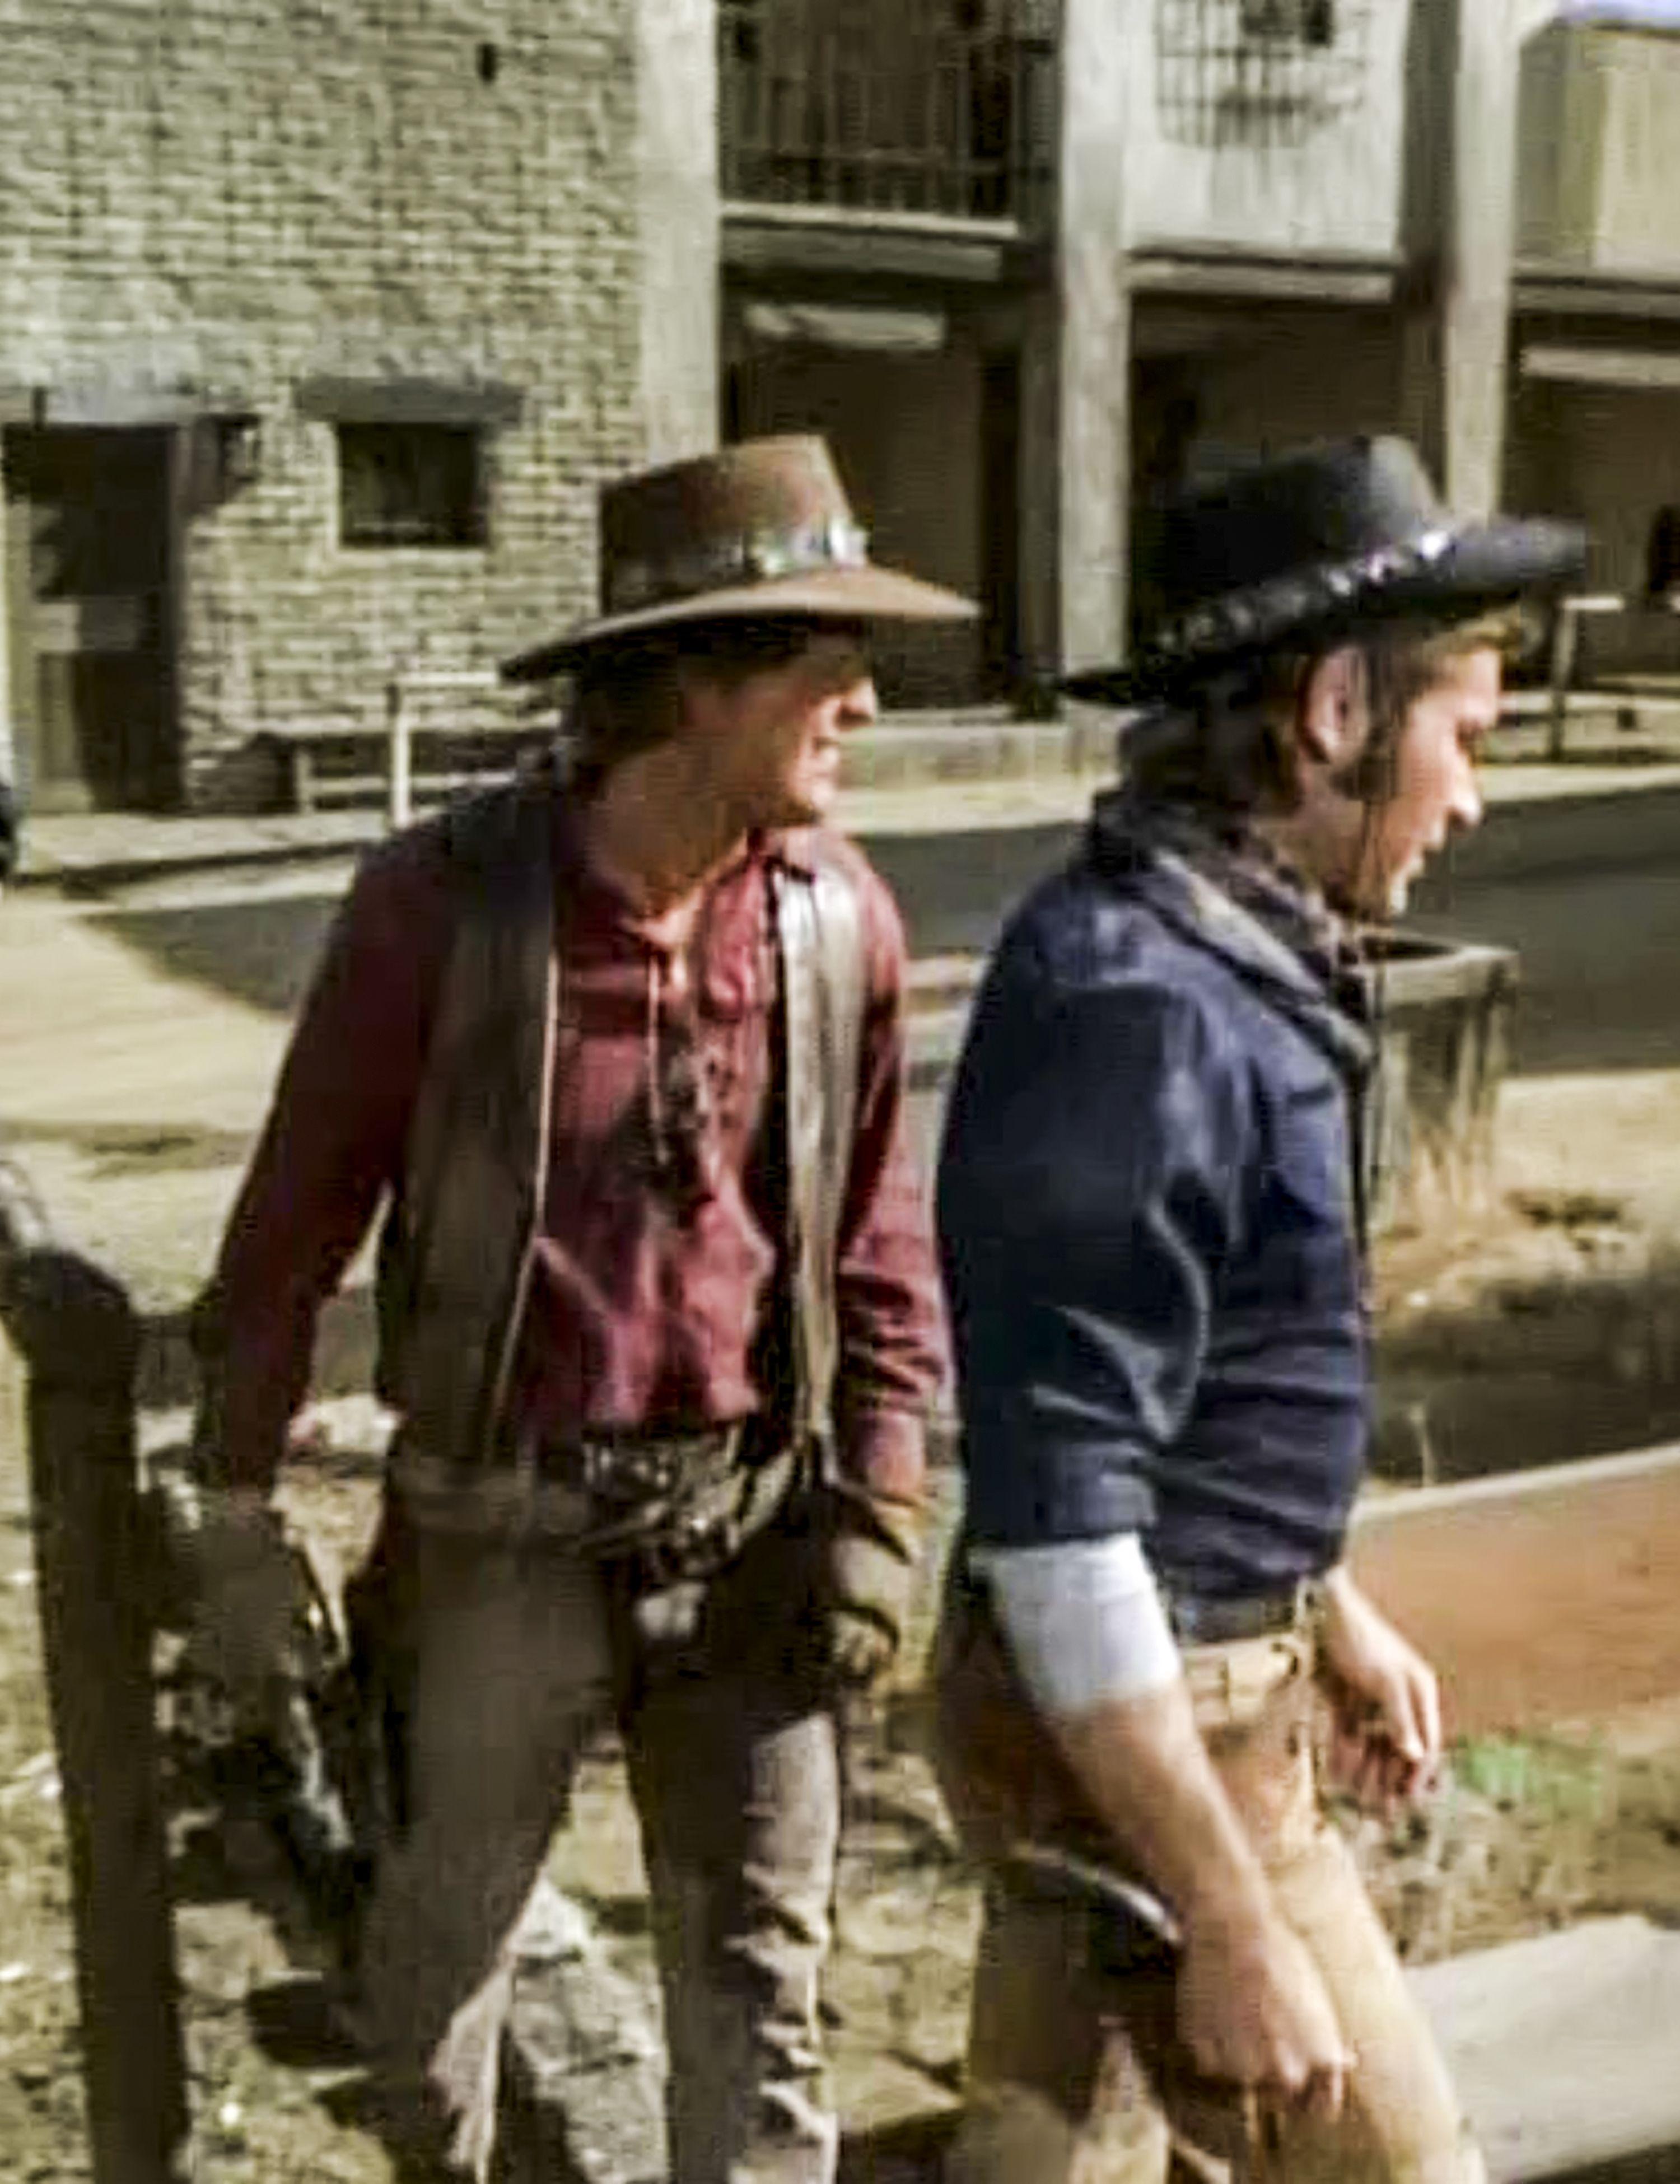 Western Tv Show Alias Smith Jones Hannibal Heyes Kid Curry Starring Pete Duel Ben